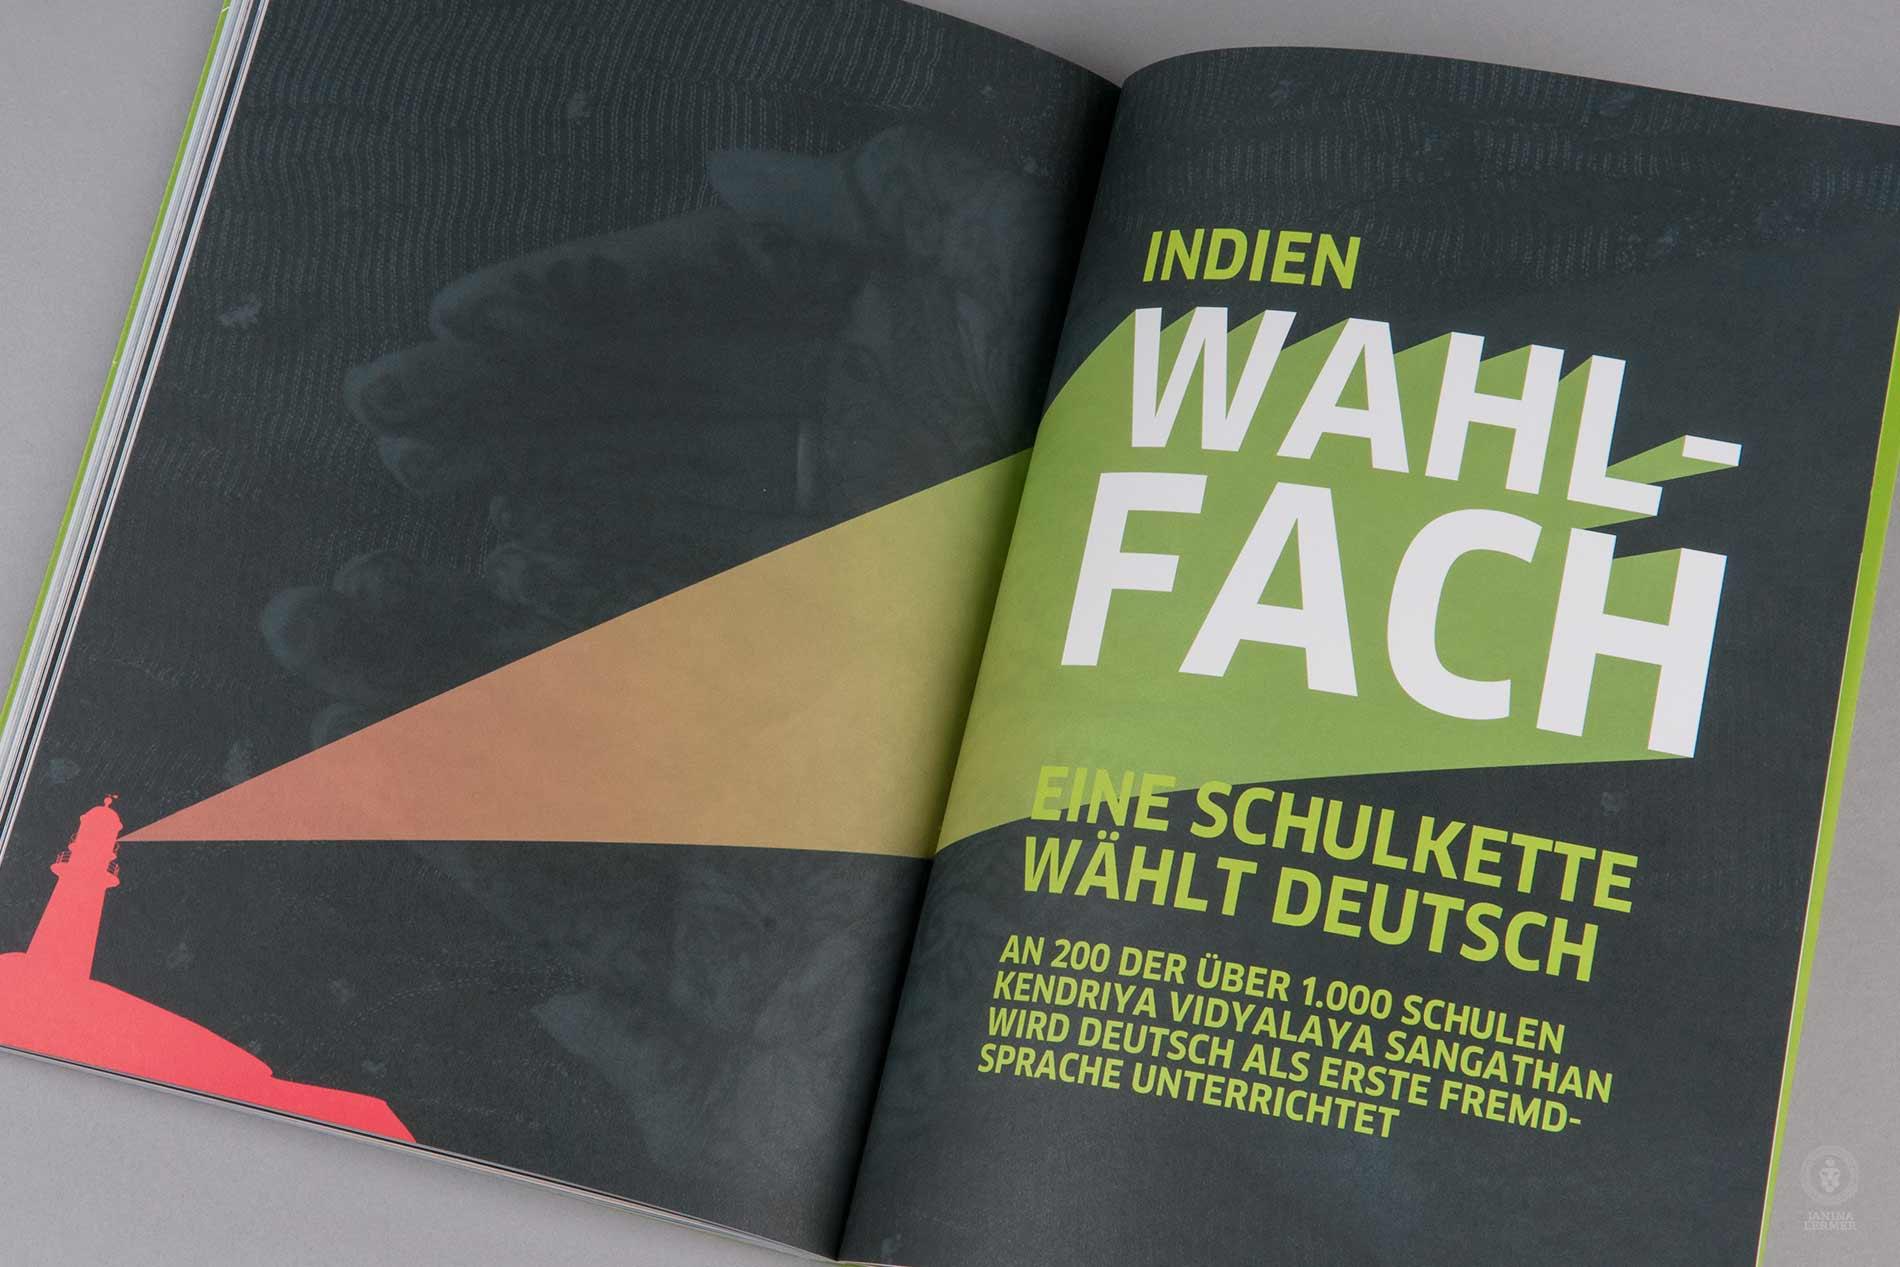 Janina-Lermer-Buchgestaltung-Magazingestaltung-Editorialdesign-Innenseite-Kapiteltrenner-seperatorpage-india-Goethe_Institut